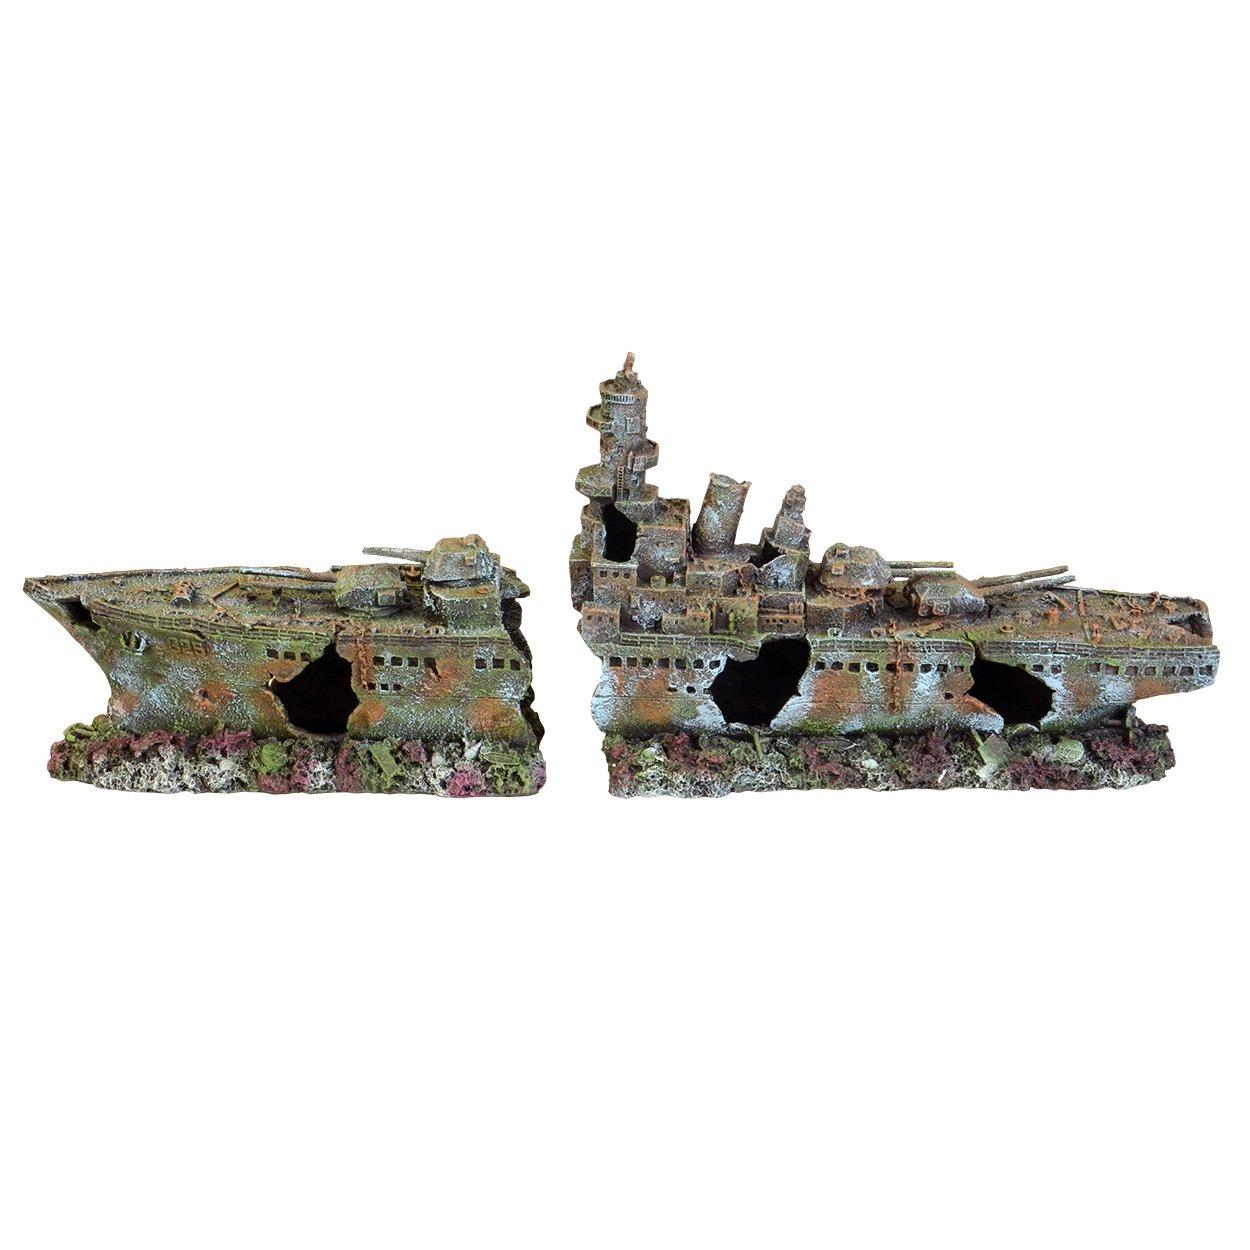 Underwater Treasures 65236 Battleship Ruins Aquarium Ornament 2 Piece by Underwater Treasures